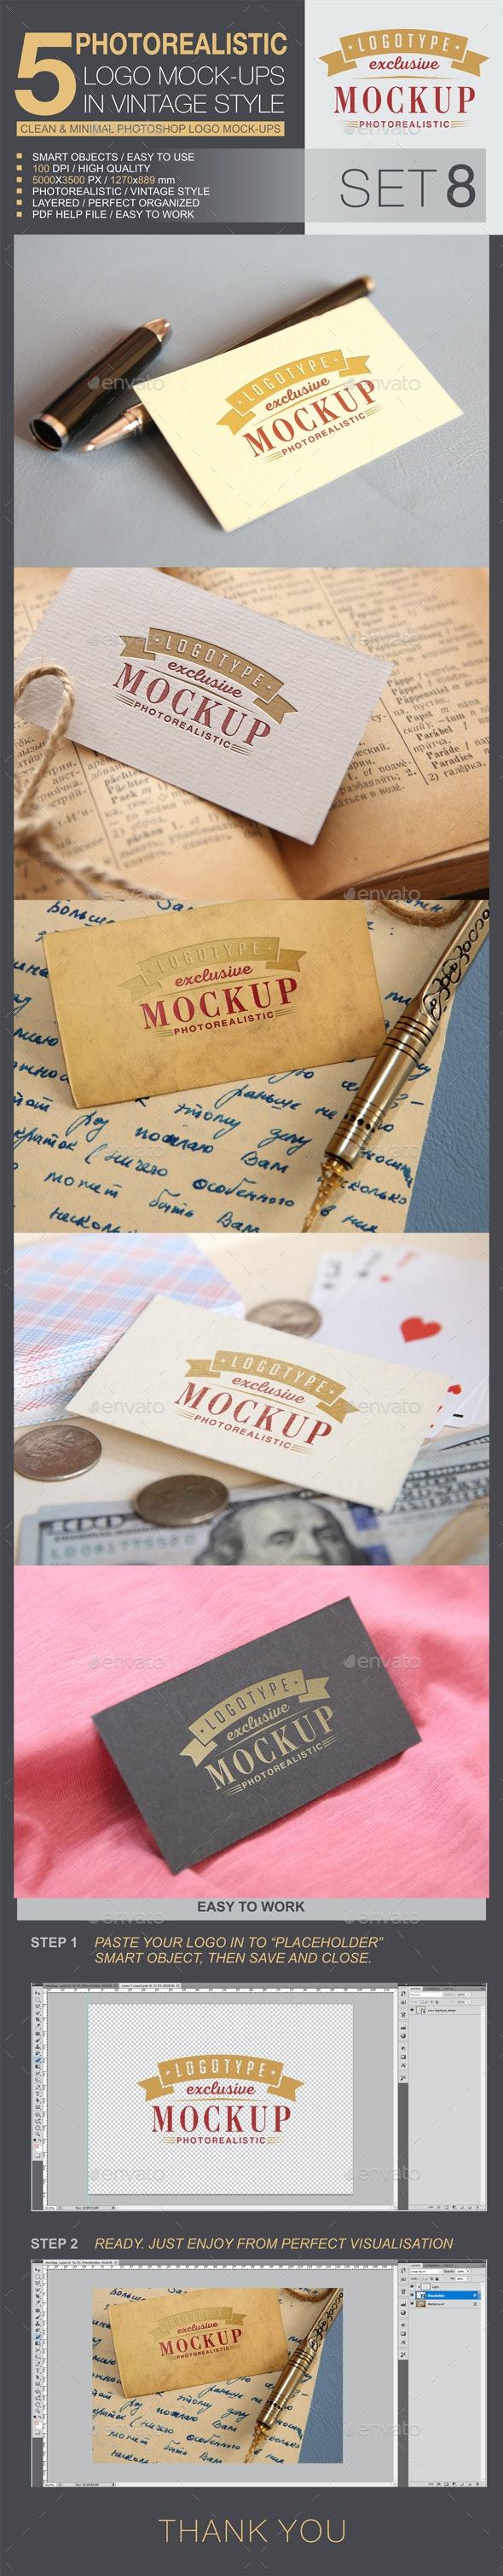 5 Logo Mock-Ups In Vintage Style - Set 8 - Logo Product Mock-Ups